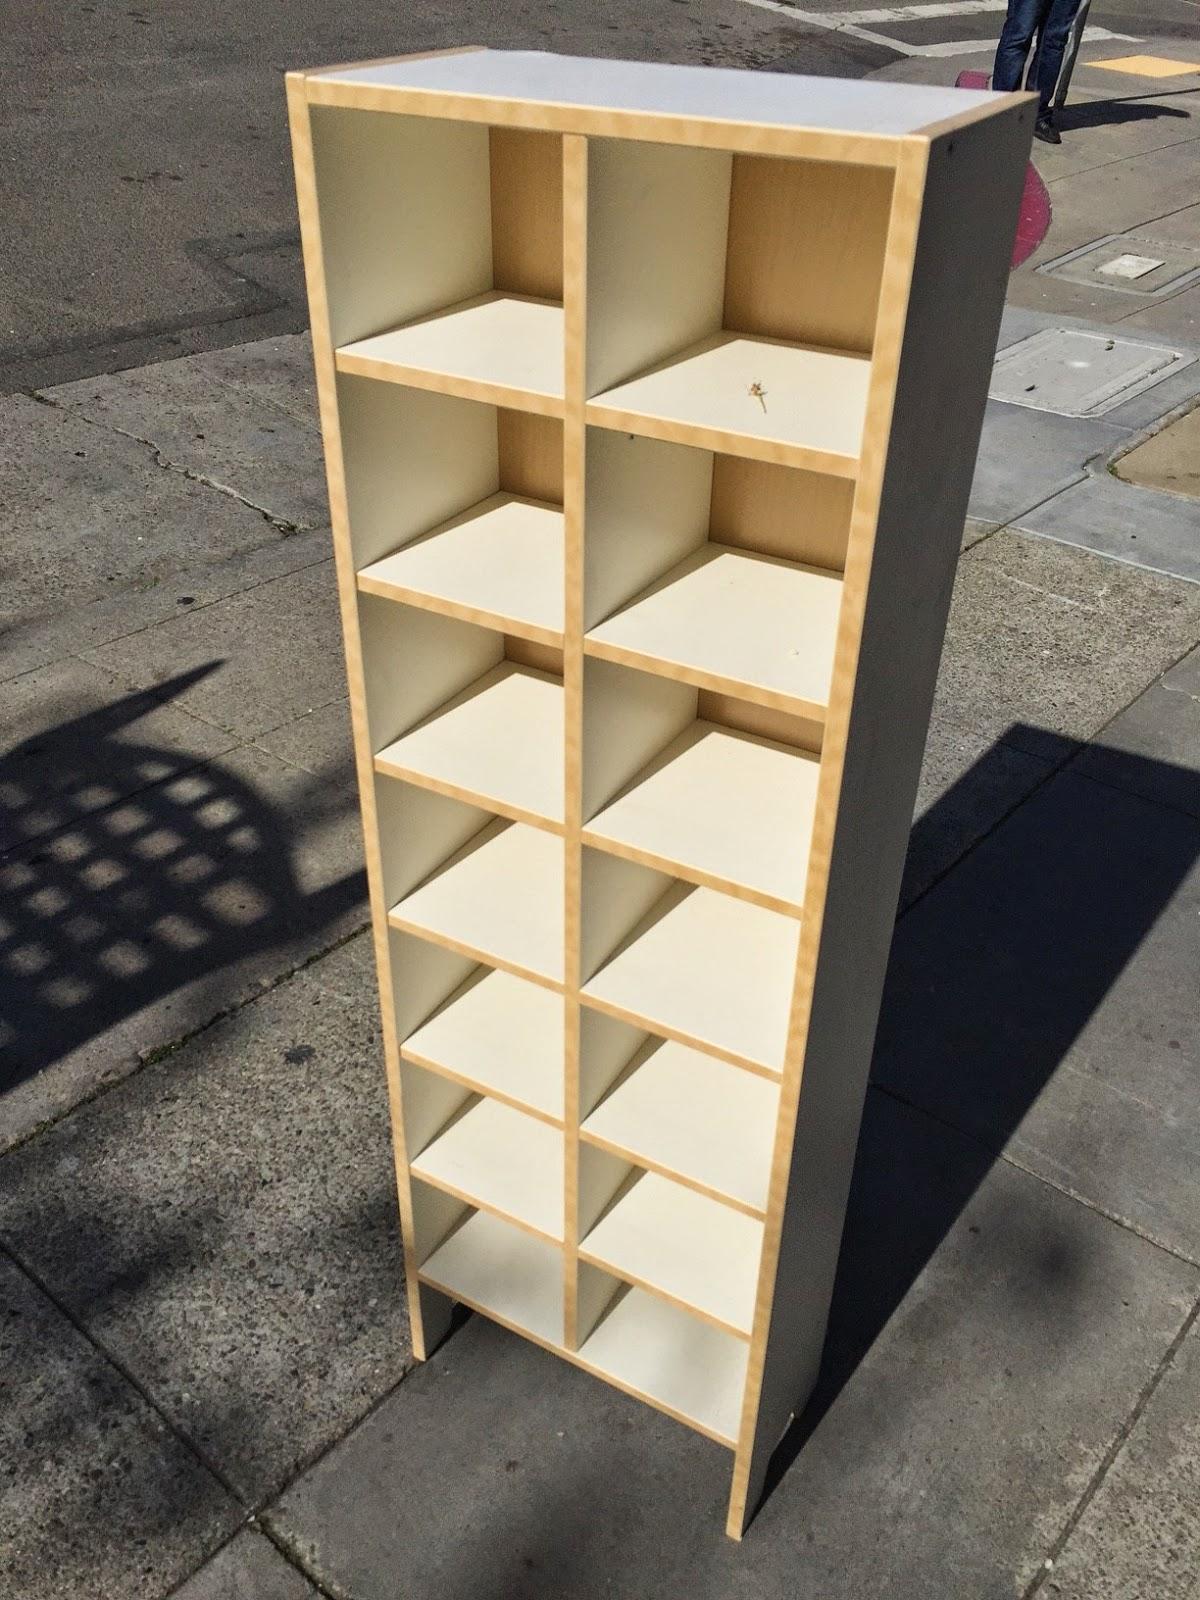 Uhuru Furniture Amp Collectibles Sold Ikea Cubby Shelf 35